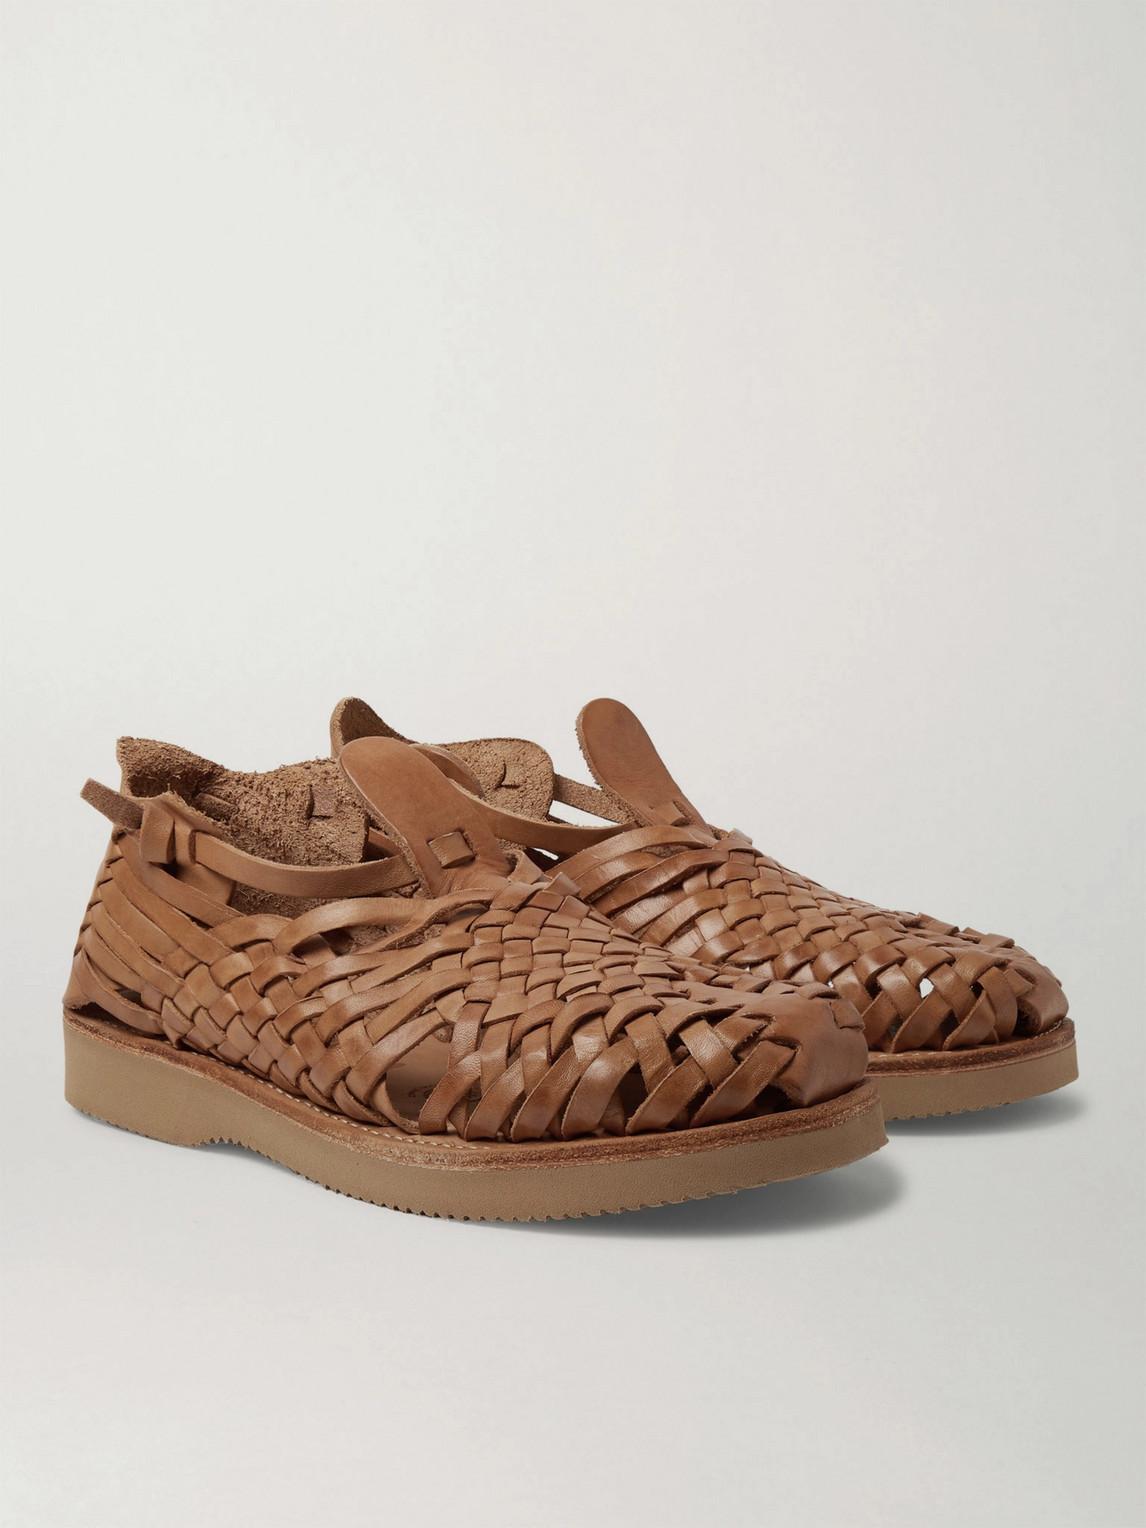 Yuketen Cruz Woven Leather Huarache